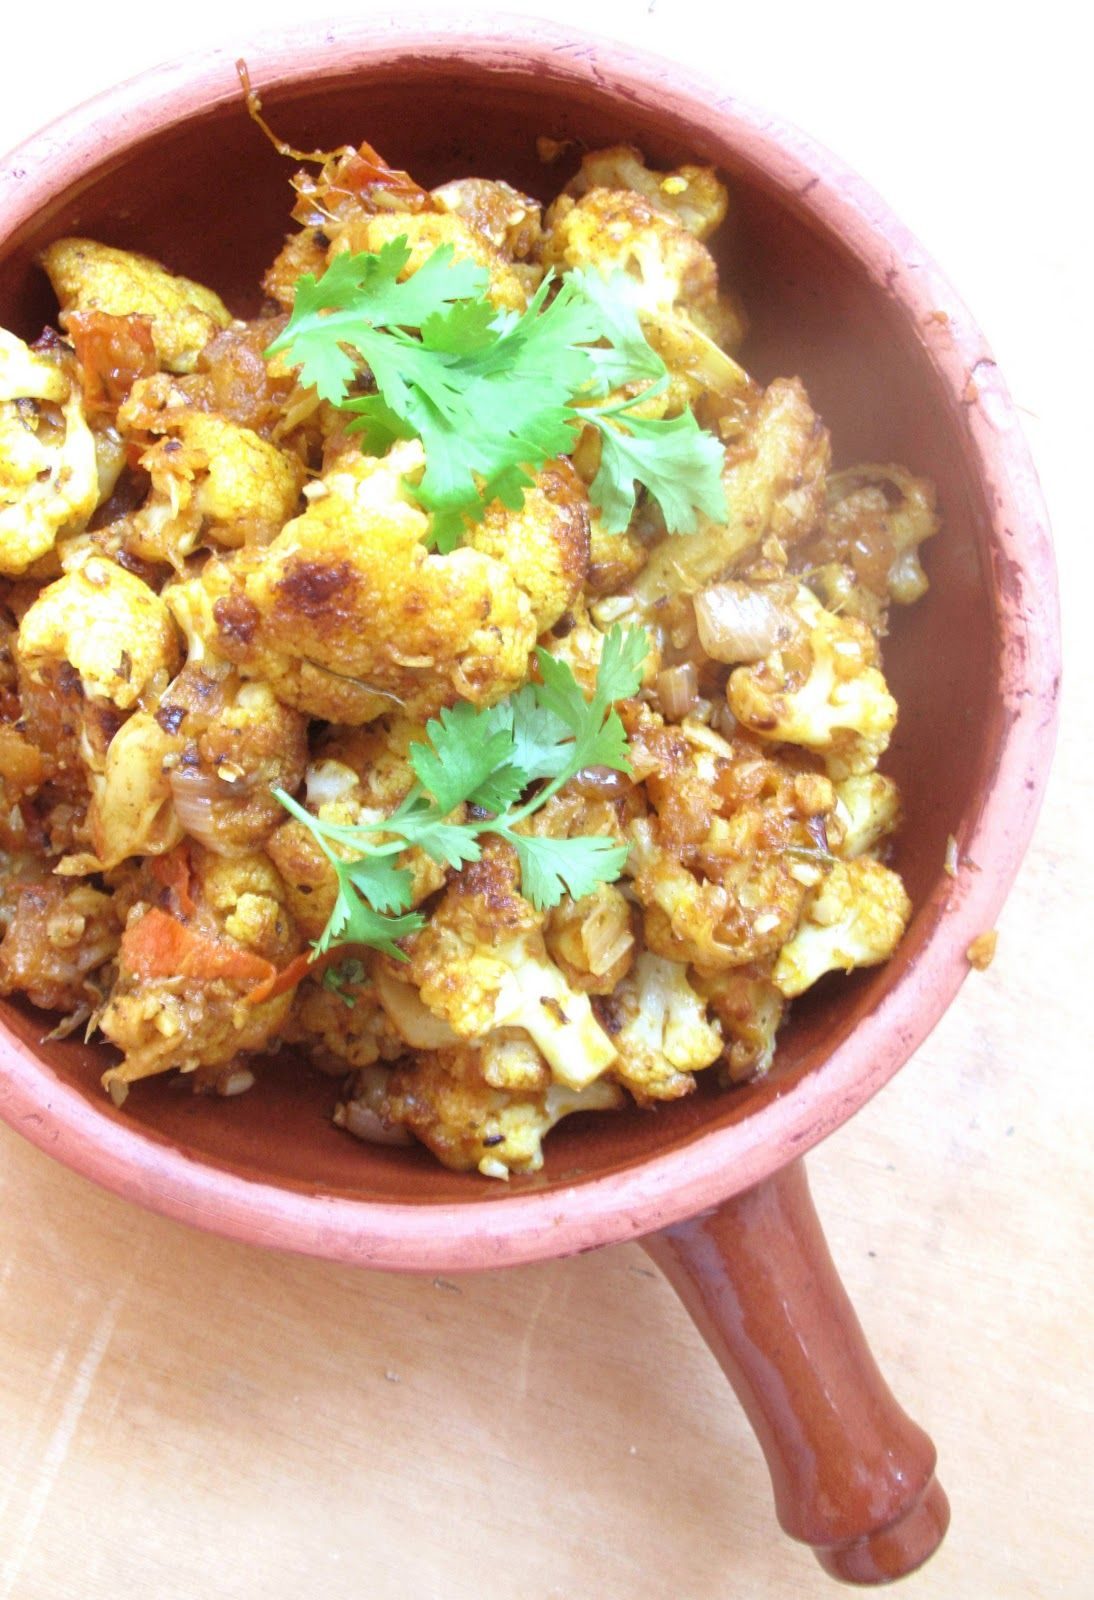 Journey Kitchen: Gobi Kasuri Methi - Cauliflower Curry With Dry Fenugreek Leaves